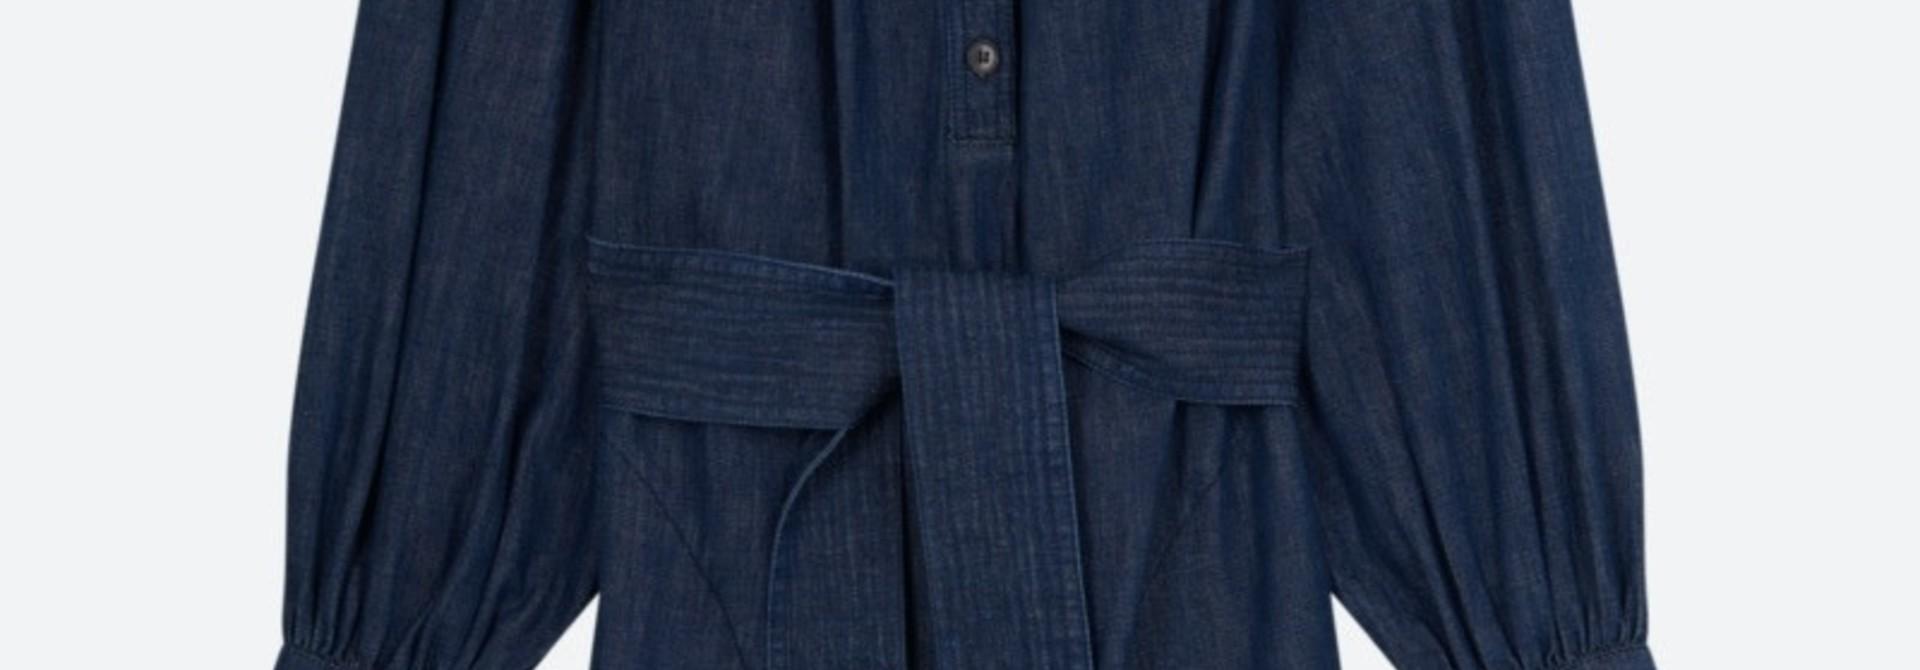 Stessie dress denim blue